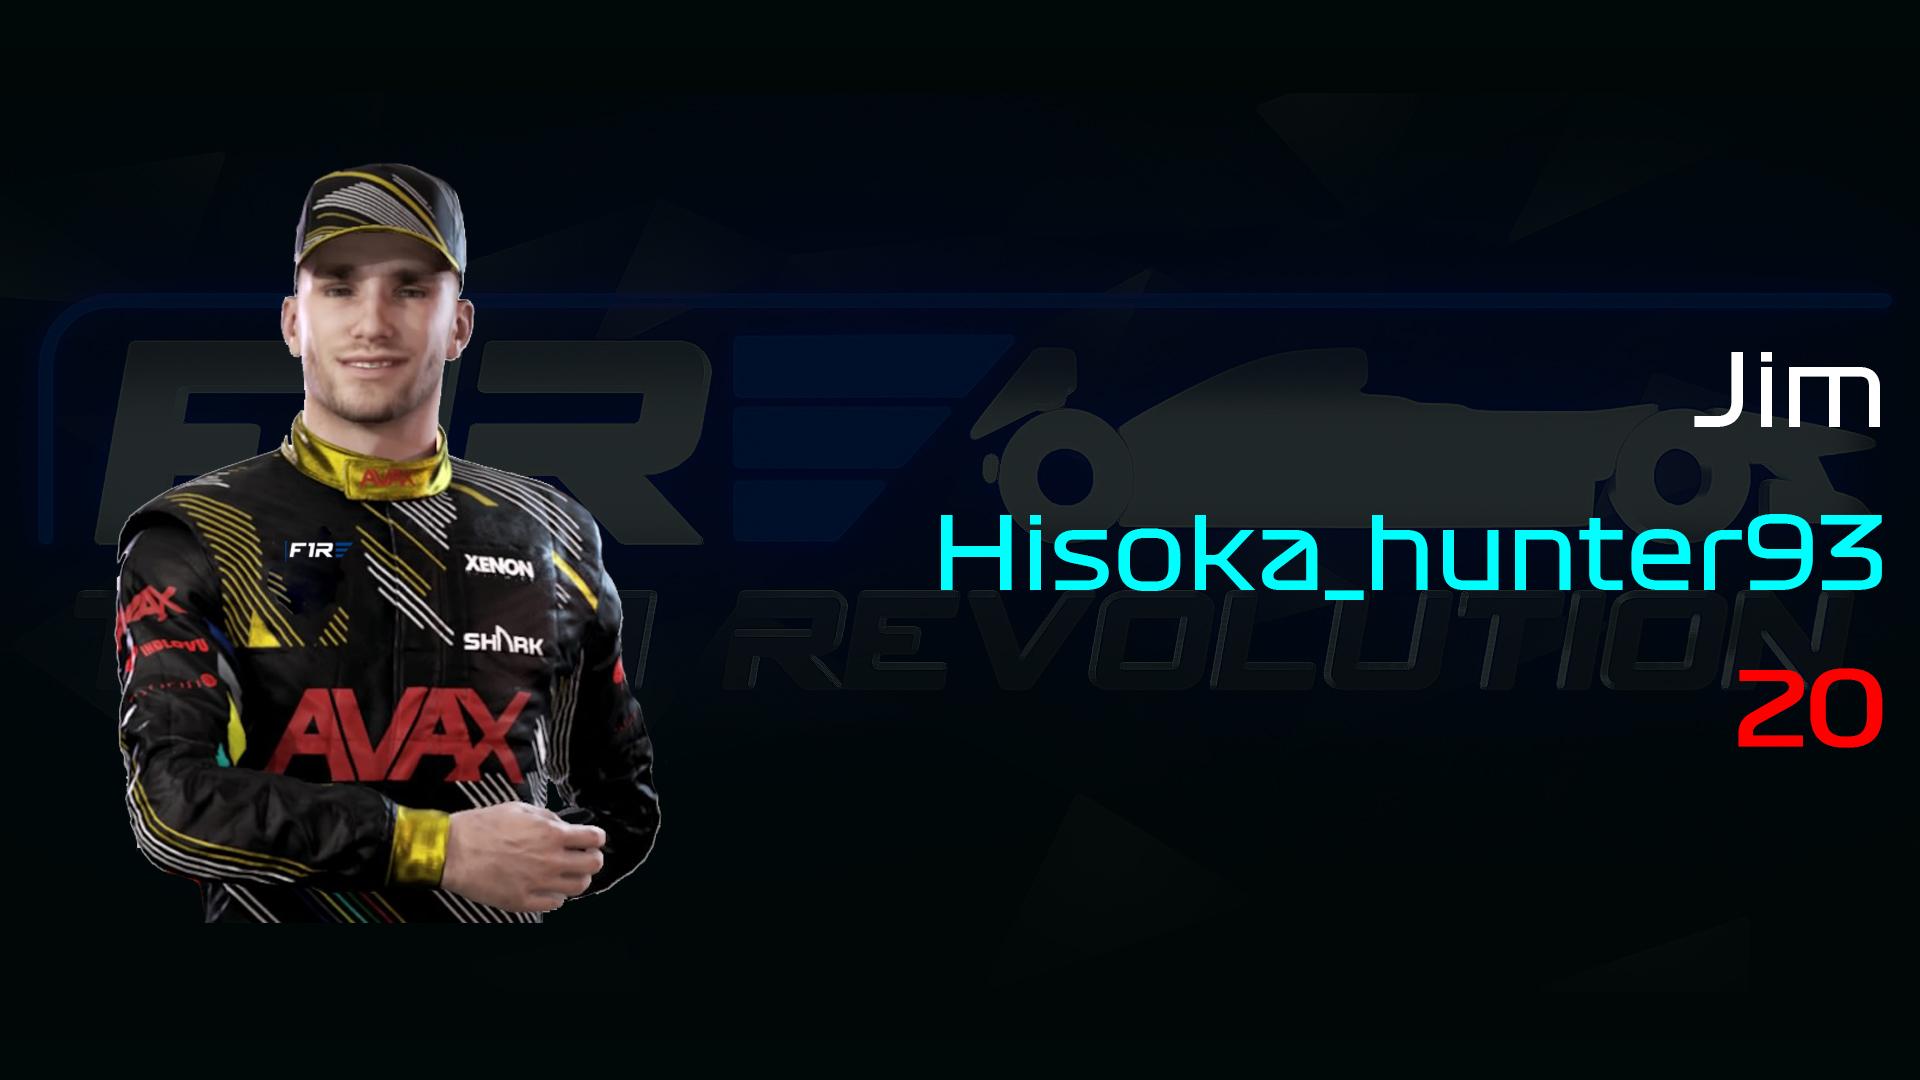 Hisoka_hunter93